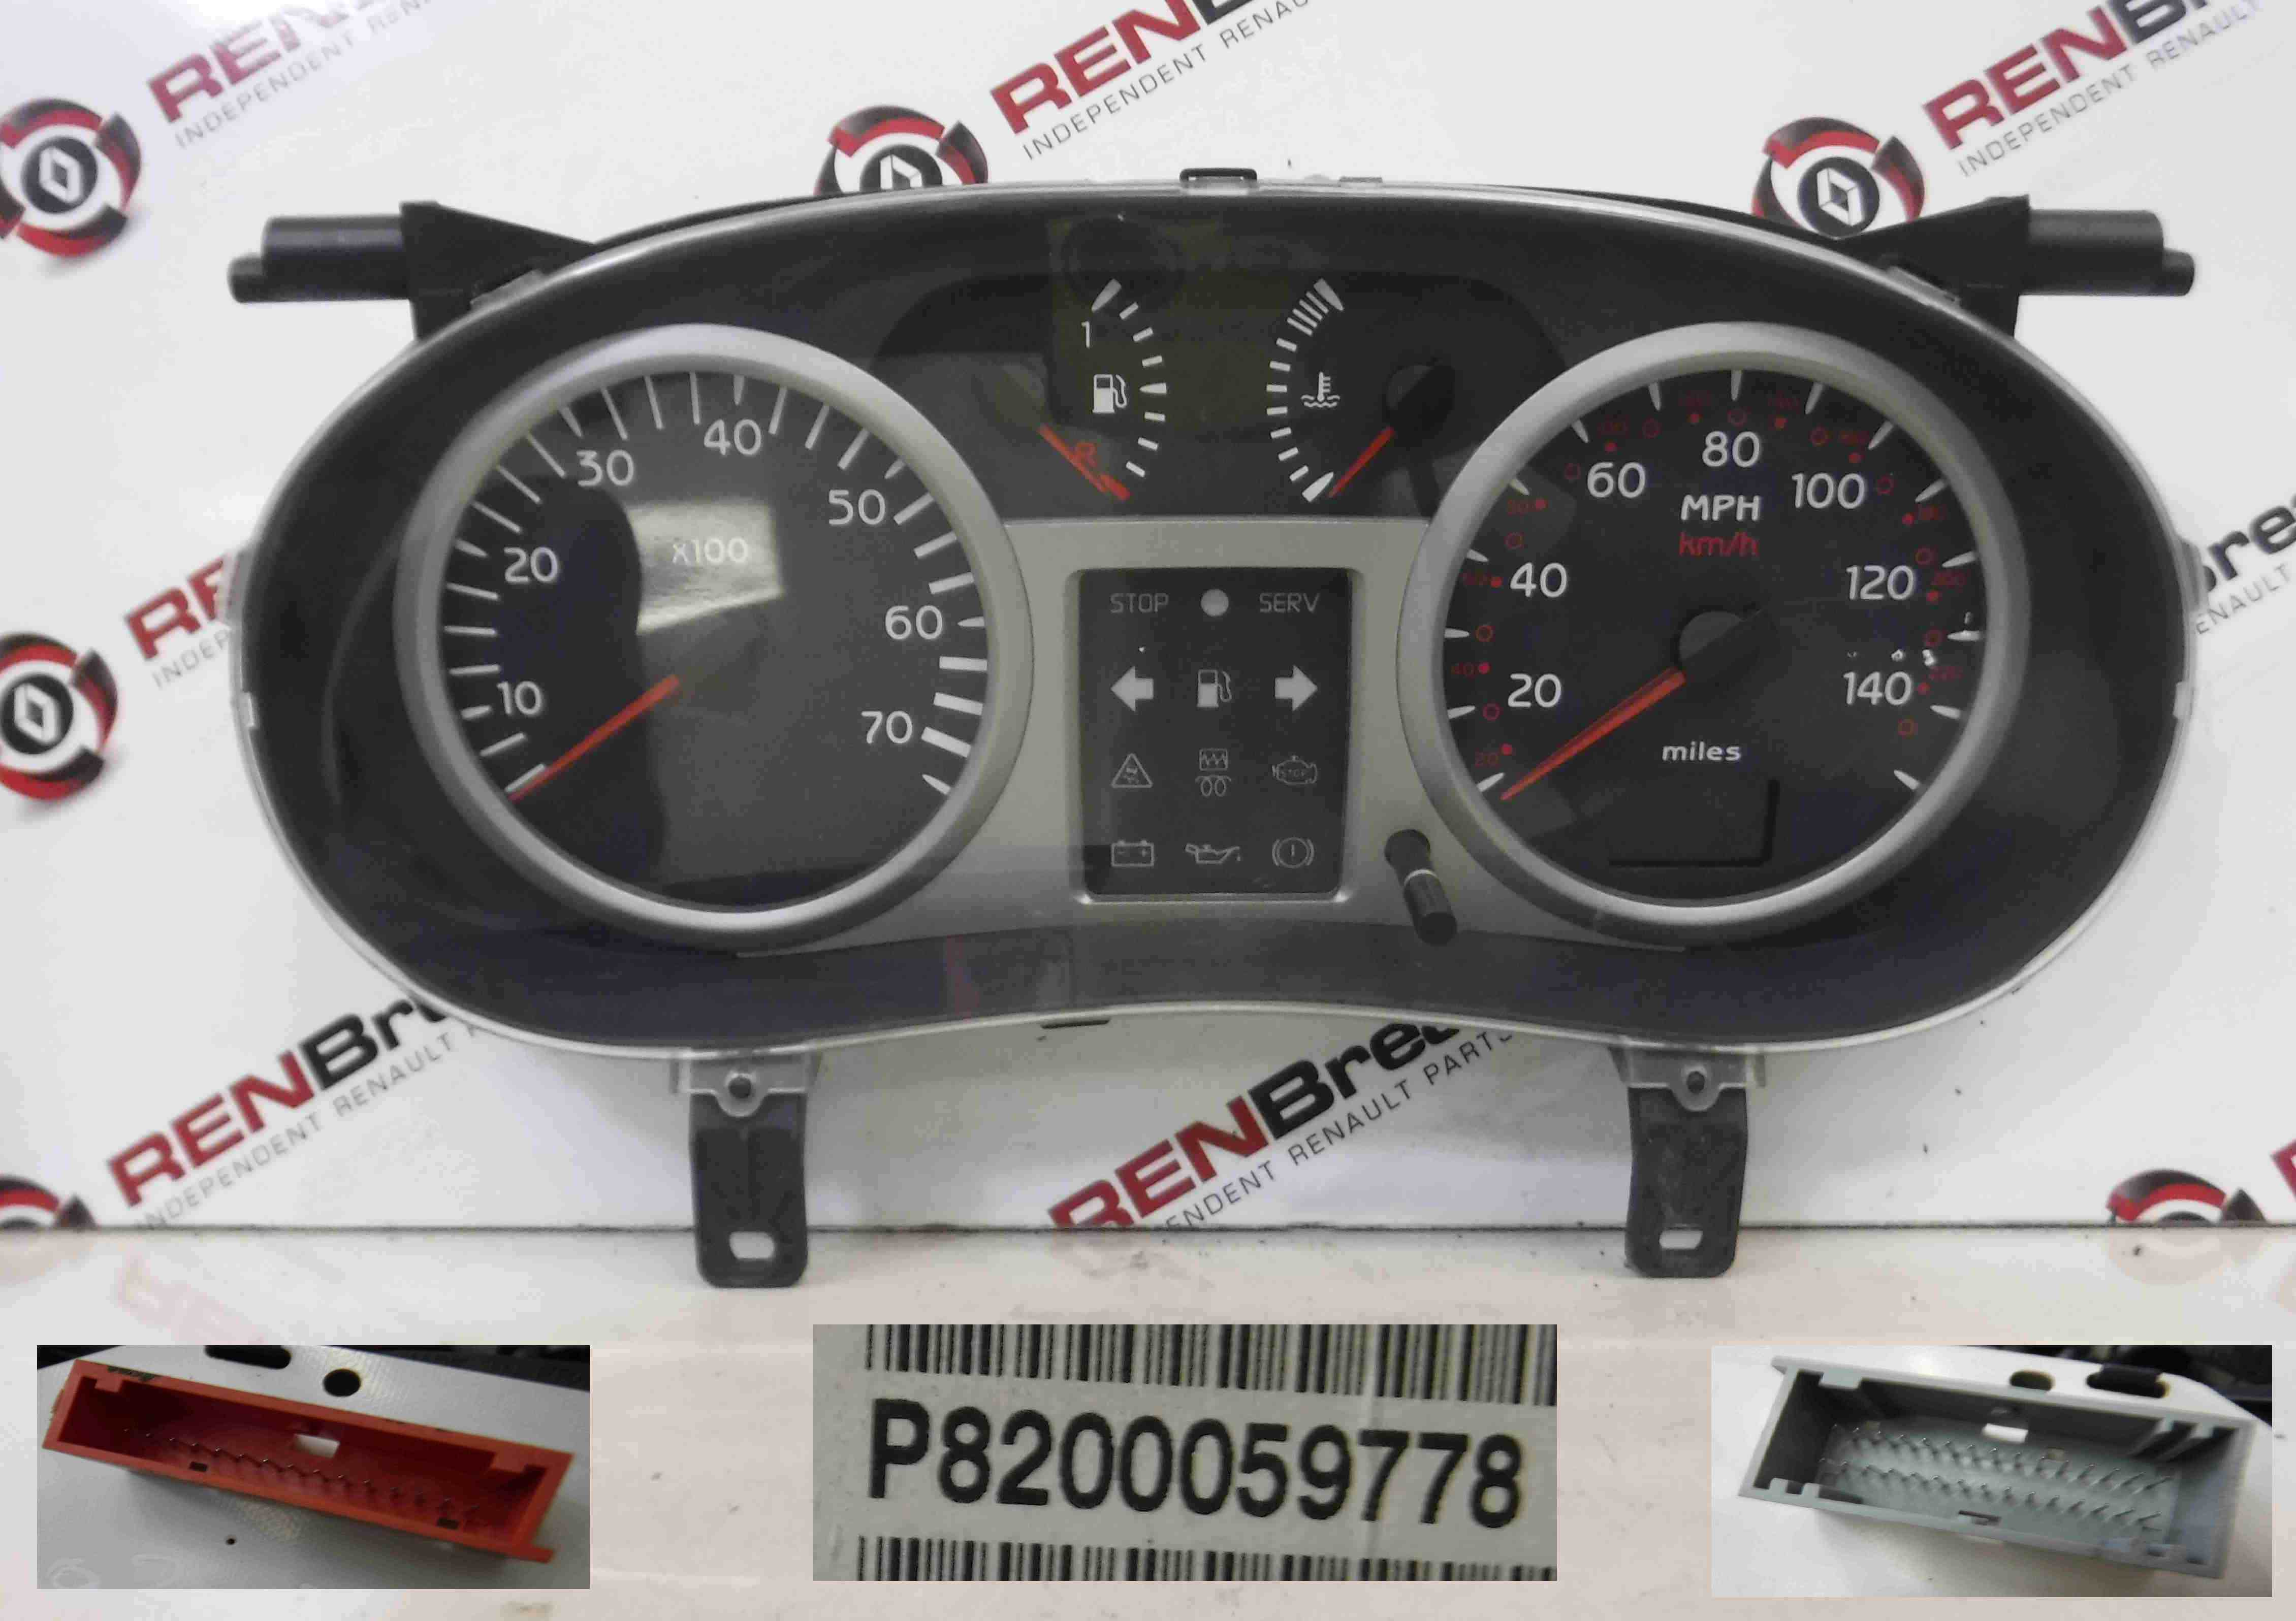 Renault-Clio-MK2-20012006-Instrument-Panel-Dials-Gauges-Speedo-Clocks-134K.jpg